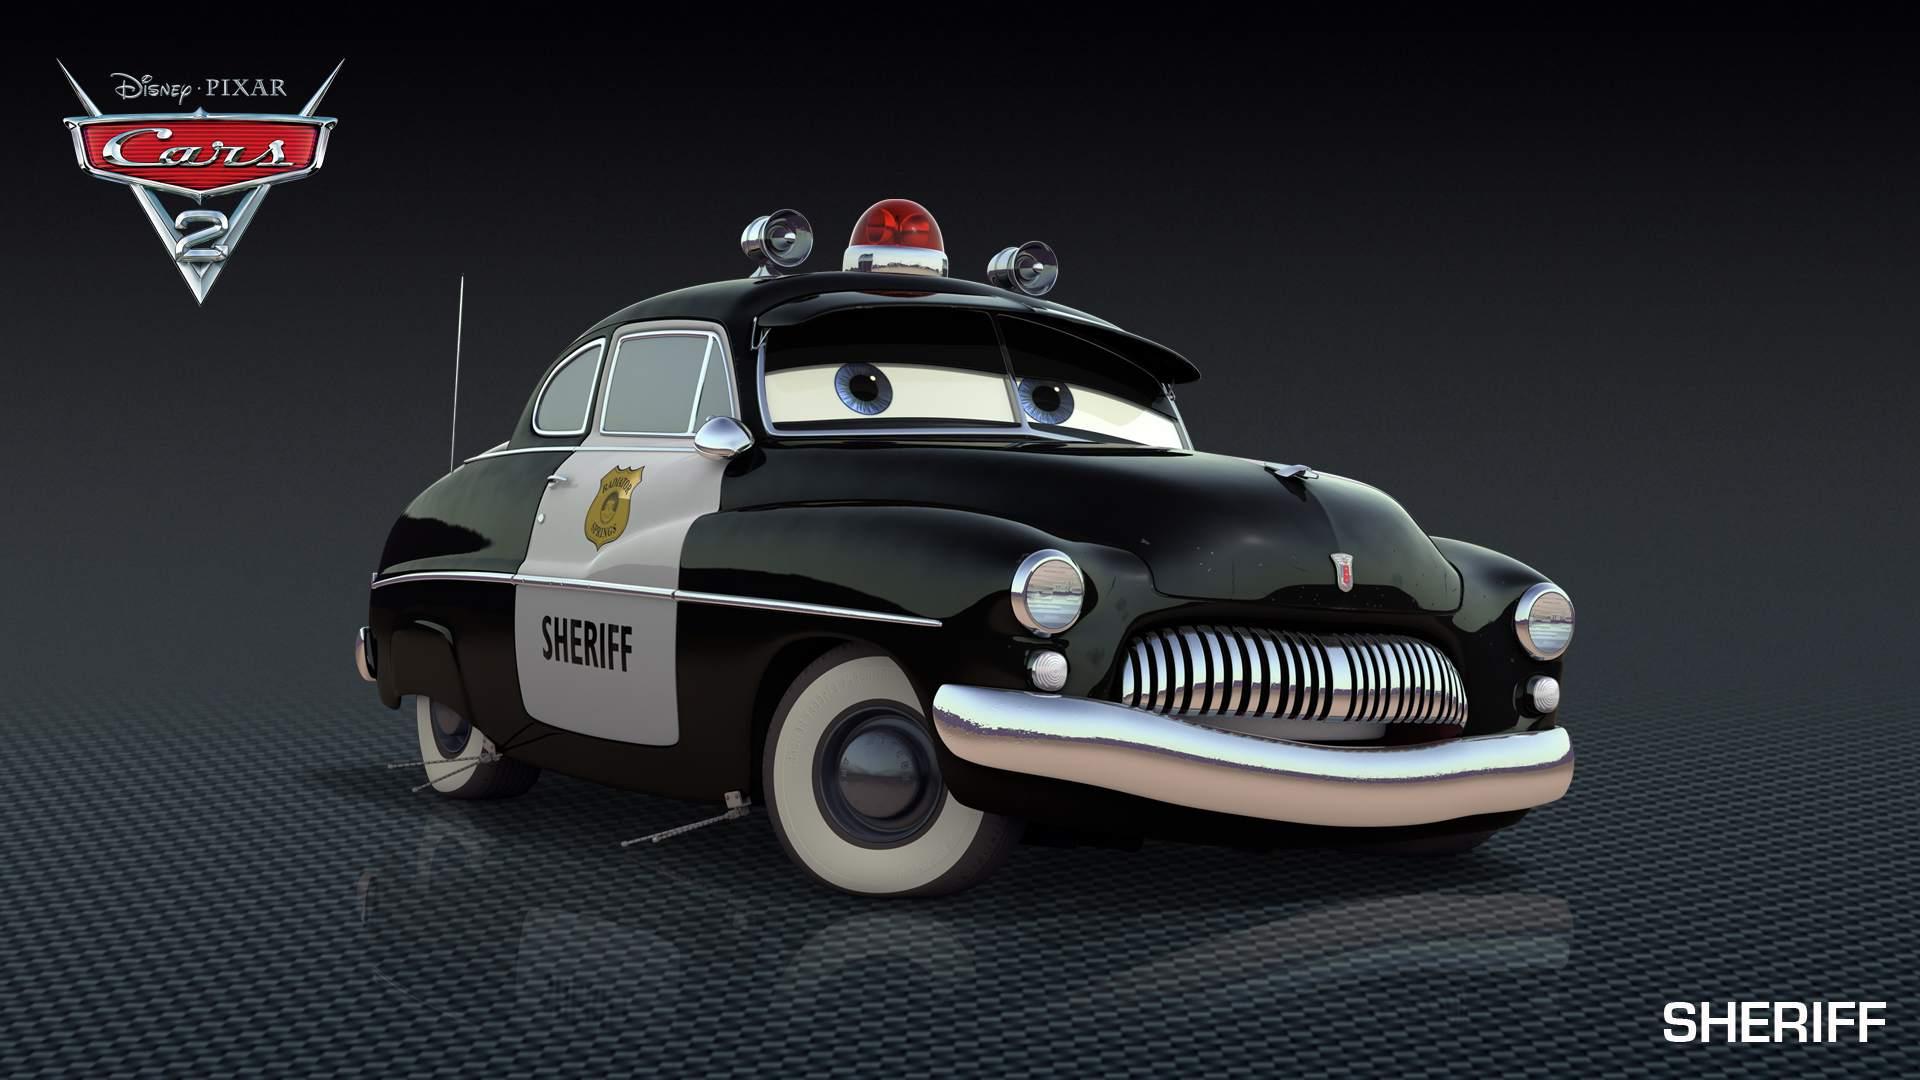 Cars 2 Characters Characters In Disney Pixar Cars 2